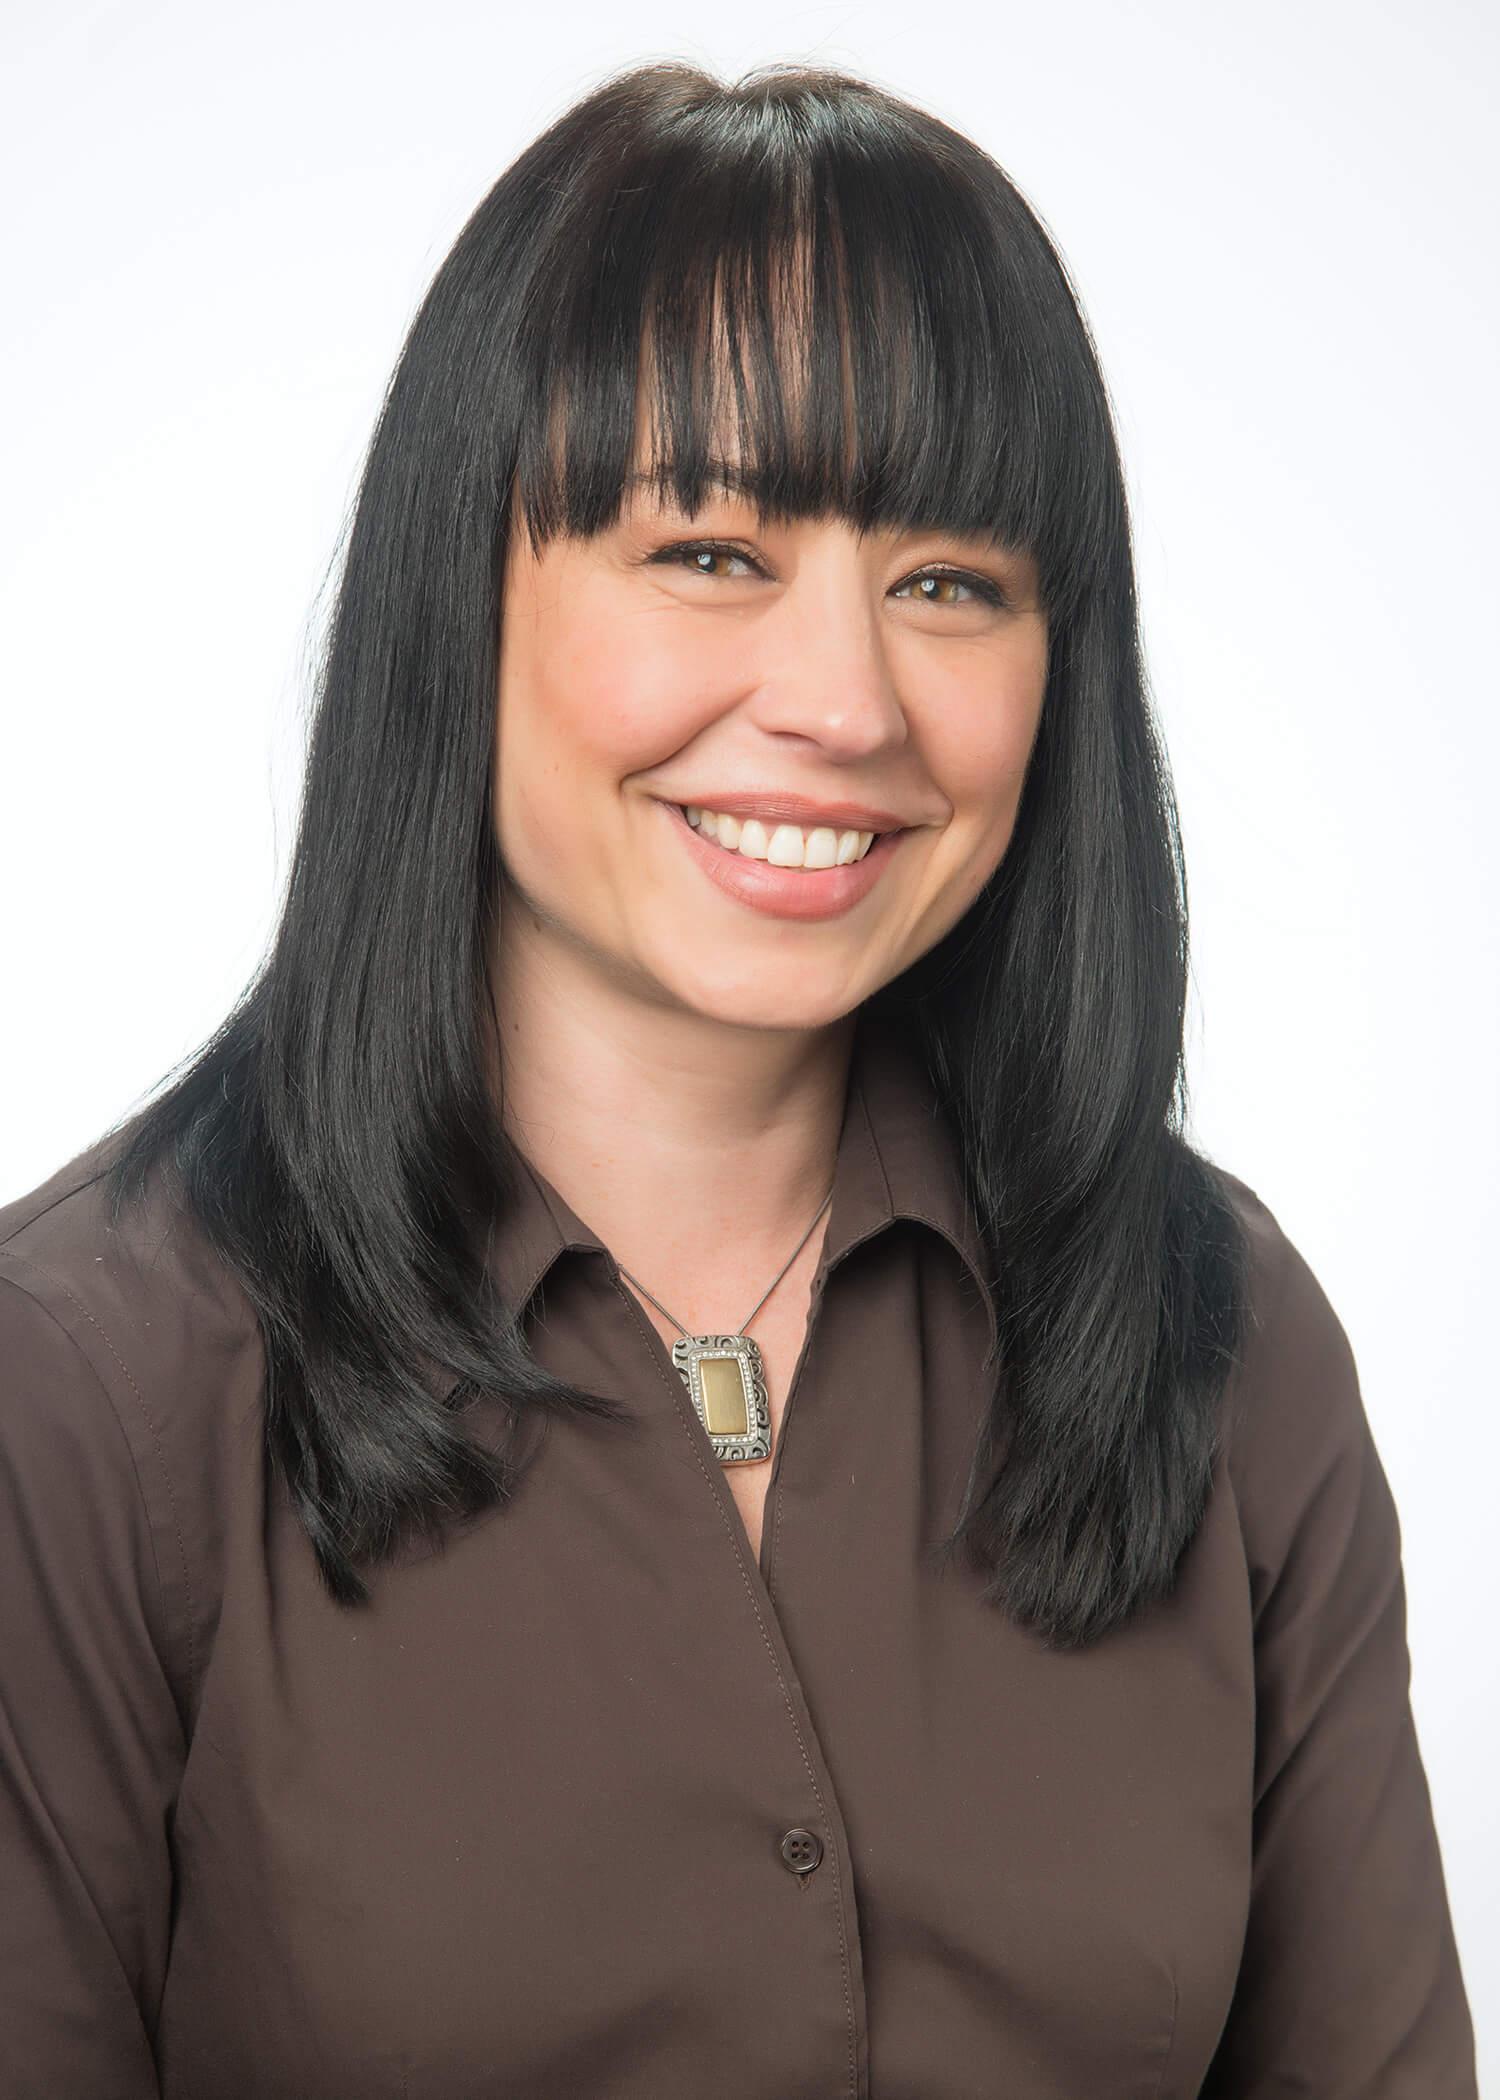 Denise McCarty